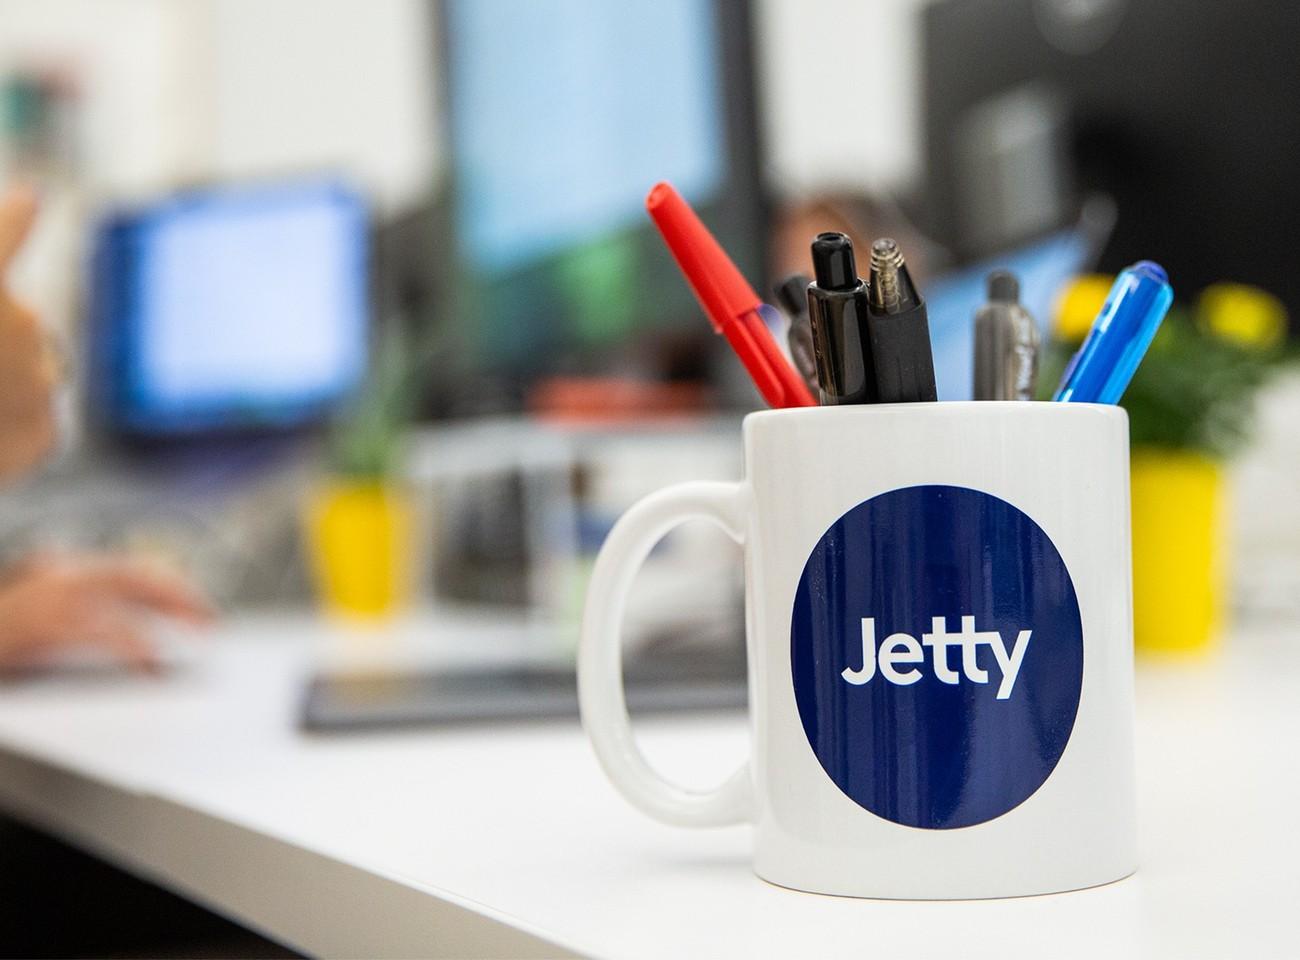 Jetty Careers